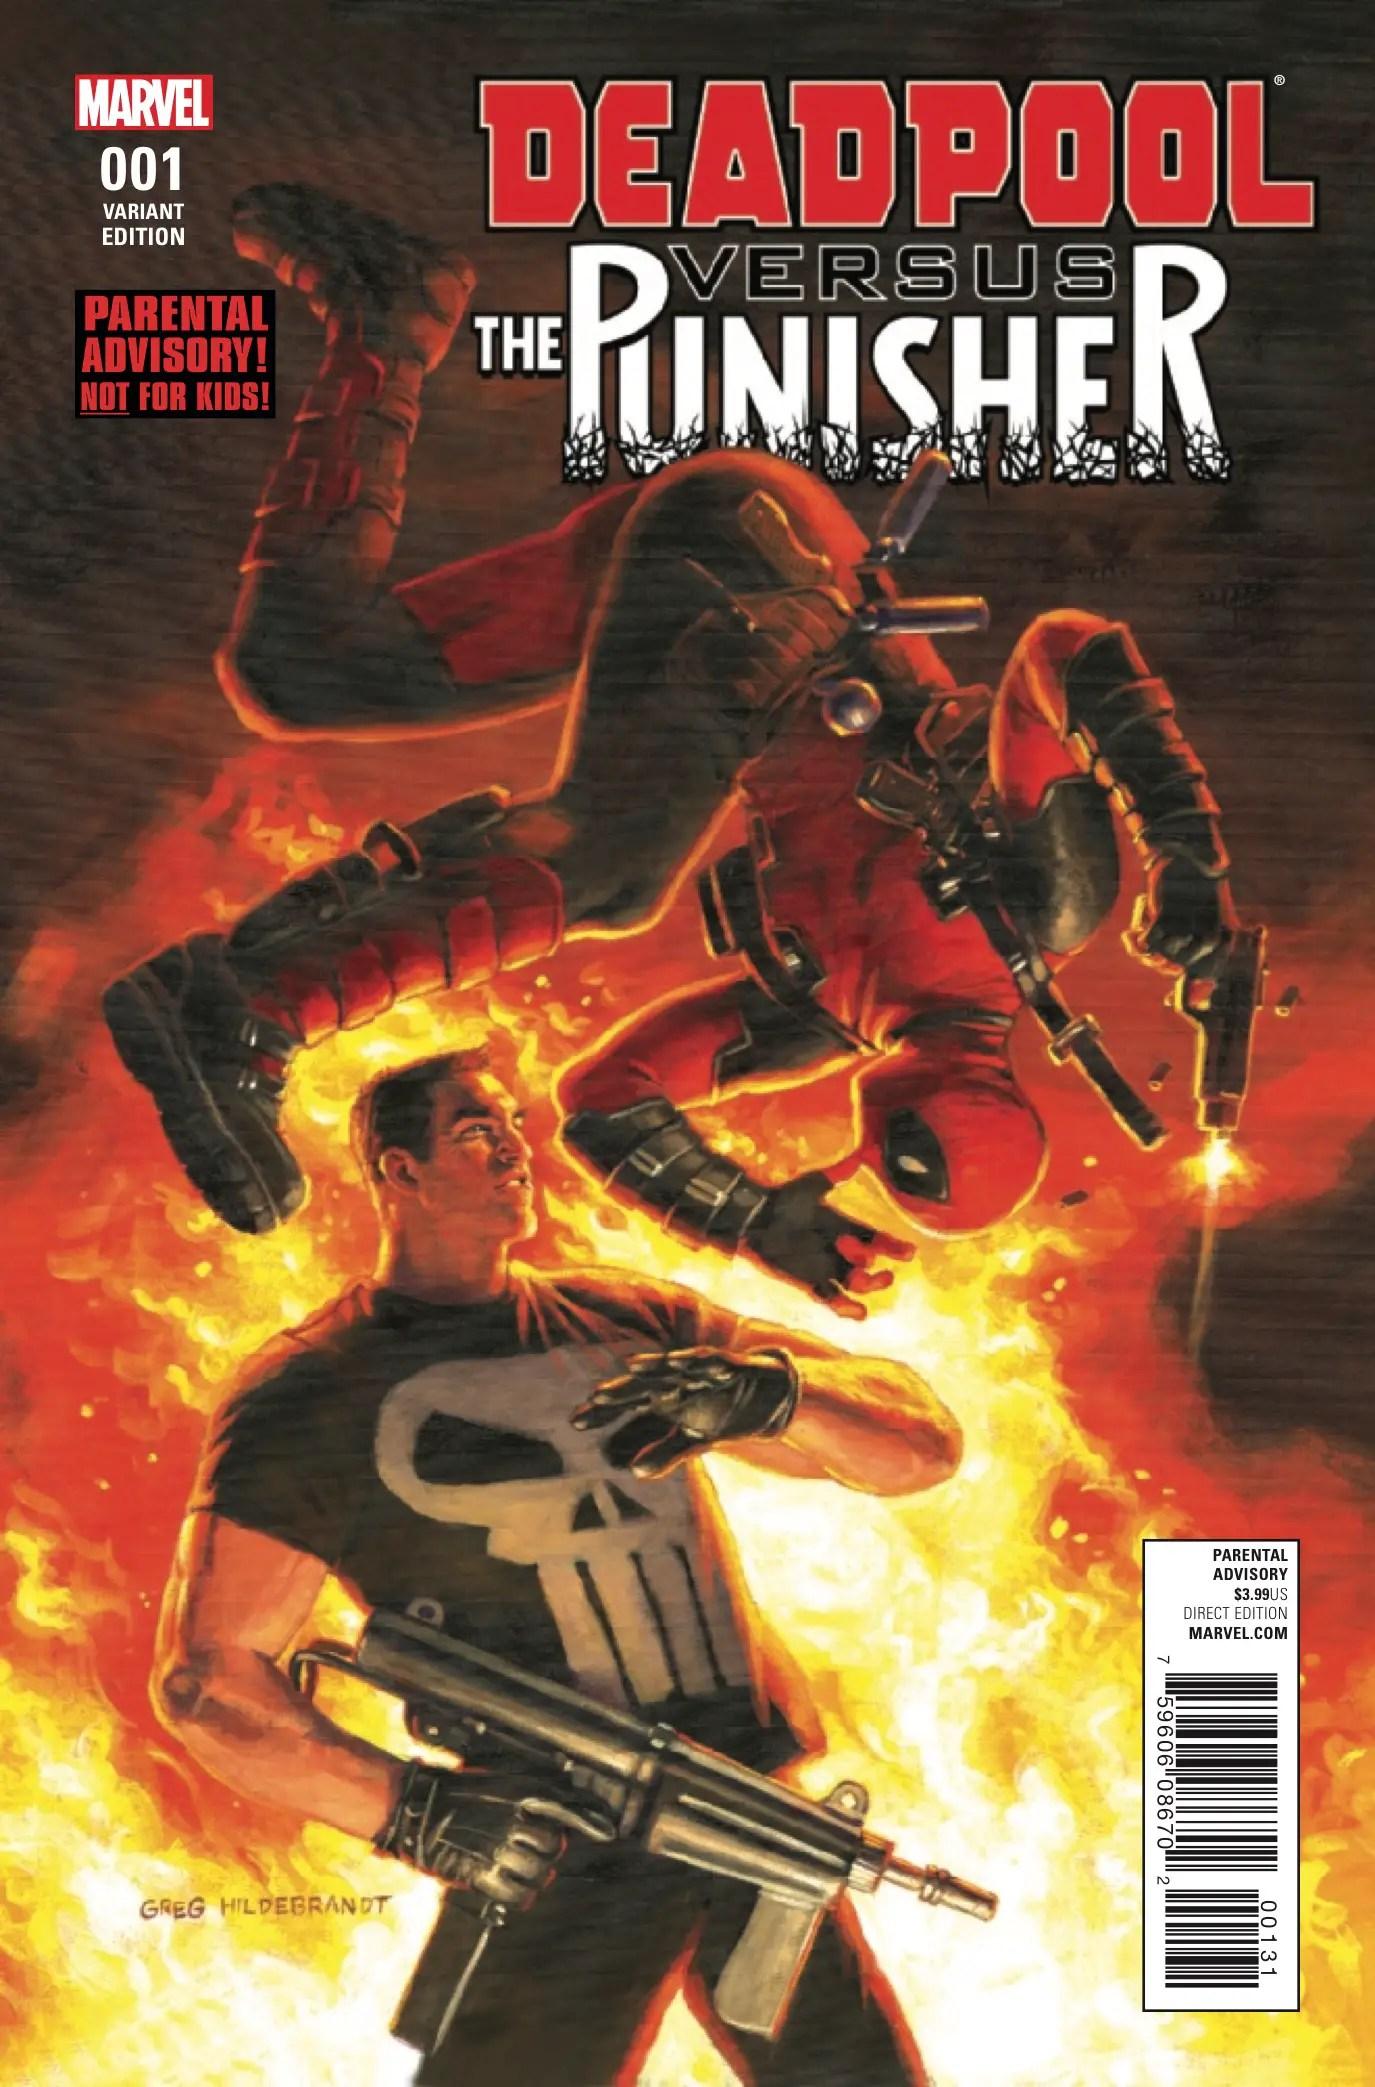 Deadpool vs. The Punisher #1 Review